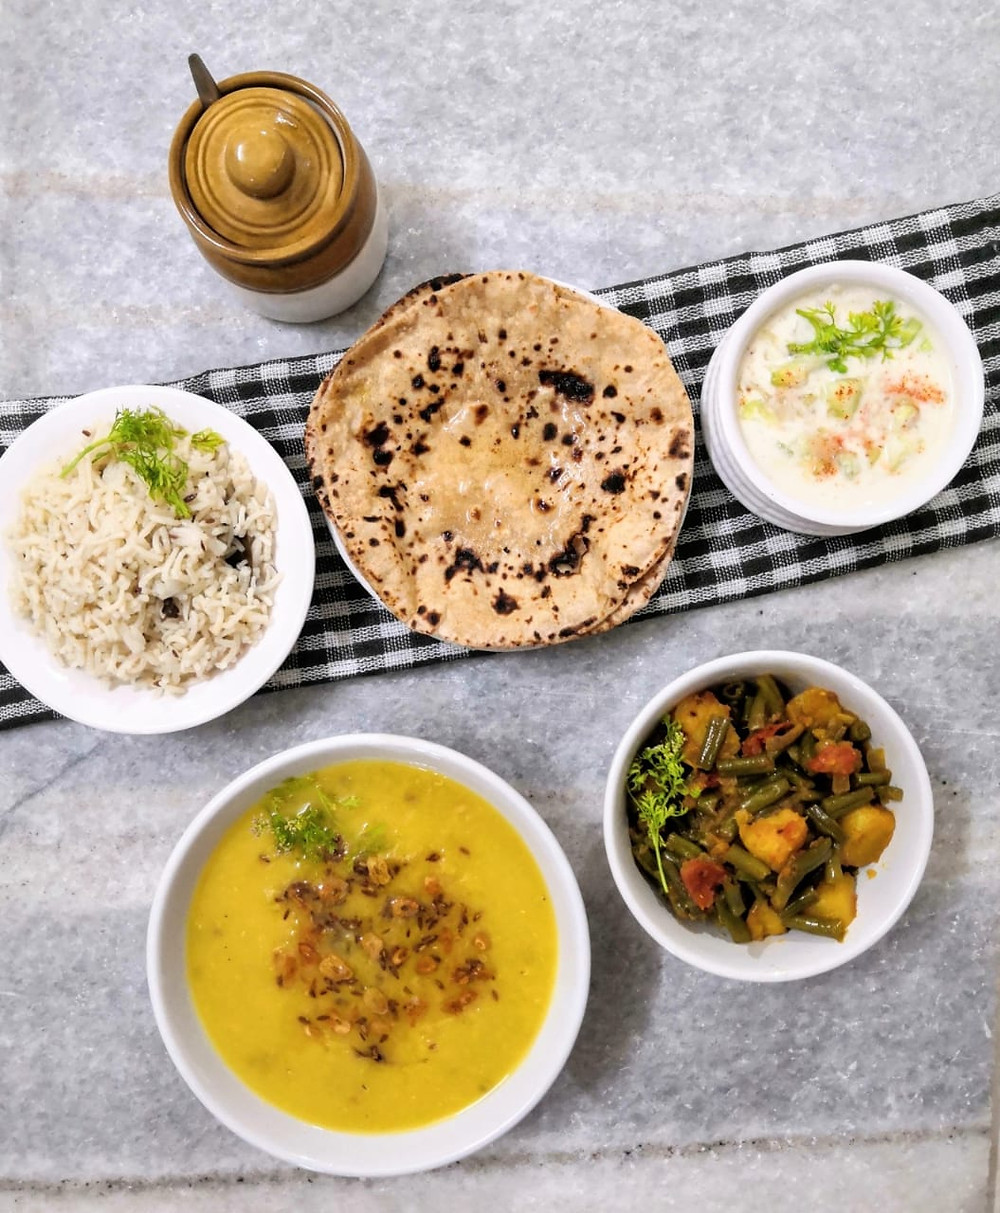 beans aloo recipe, green beans and potatoes recipes, indian masala recipe, indian meal ideas, basic moong dal tadka recipe, cucumber raita recipe, traditional indian recipes, indian food recipe blog whiskmixstir, sheetal jandial